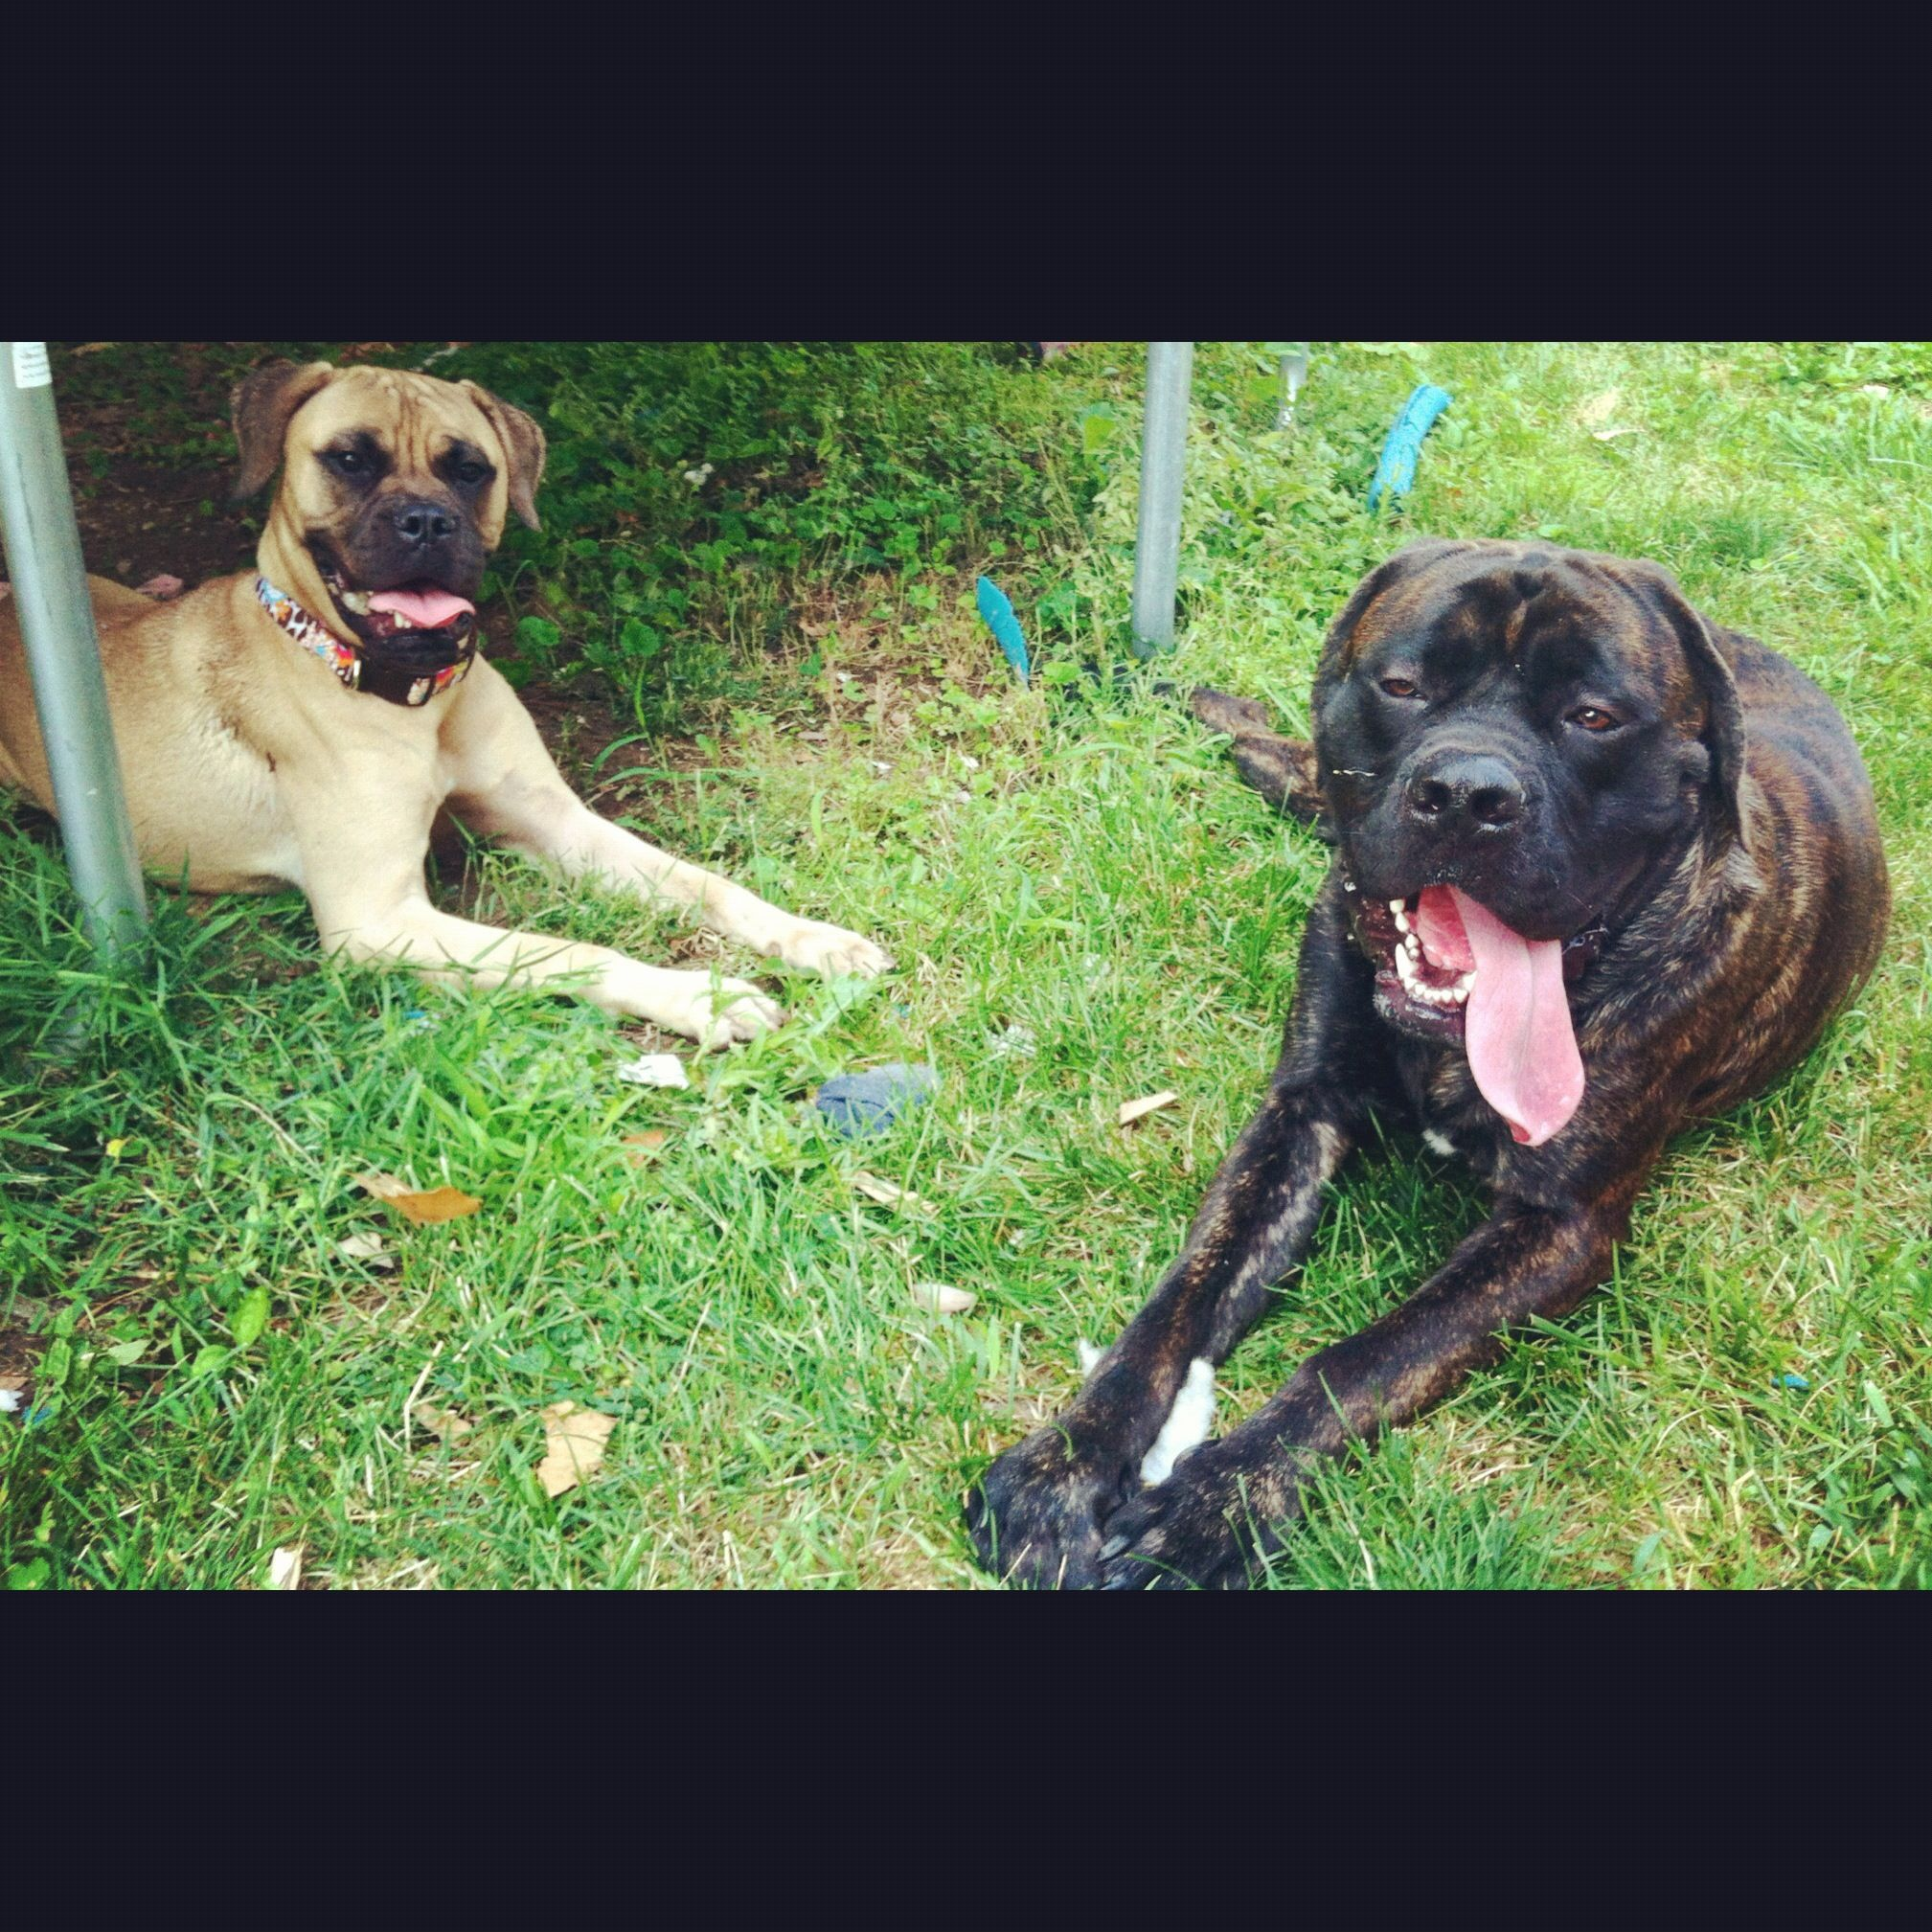 Both 1 year old. Fawn bullmastiff Zoe and brindle English mastiff Apollo